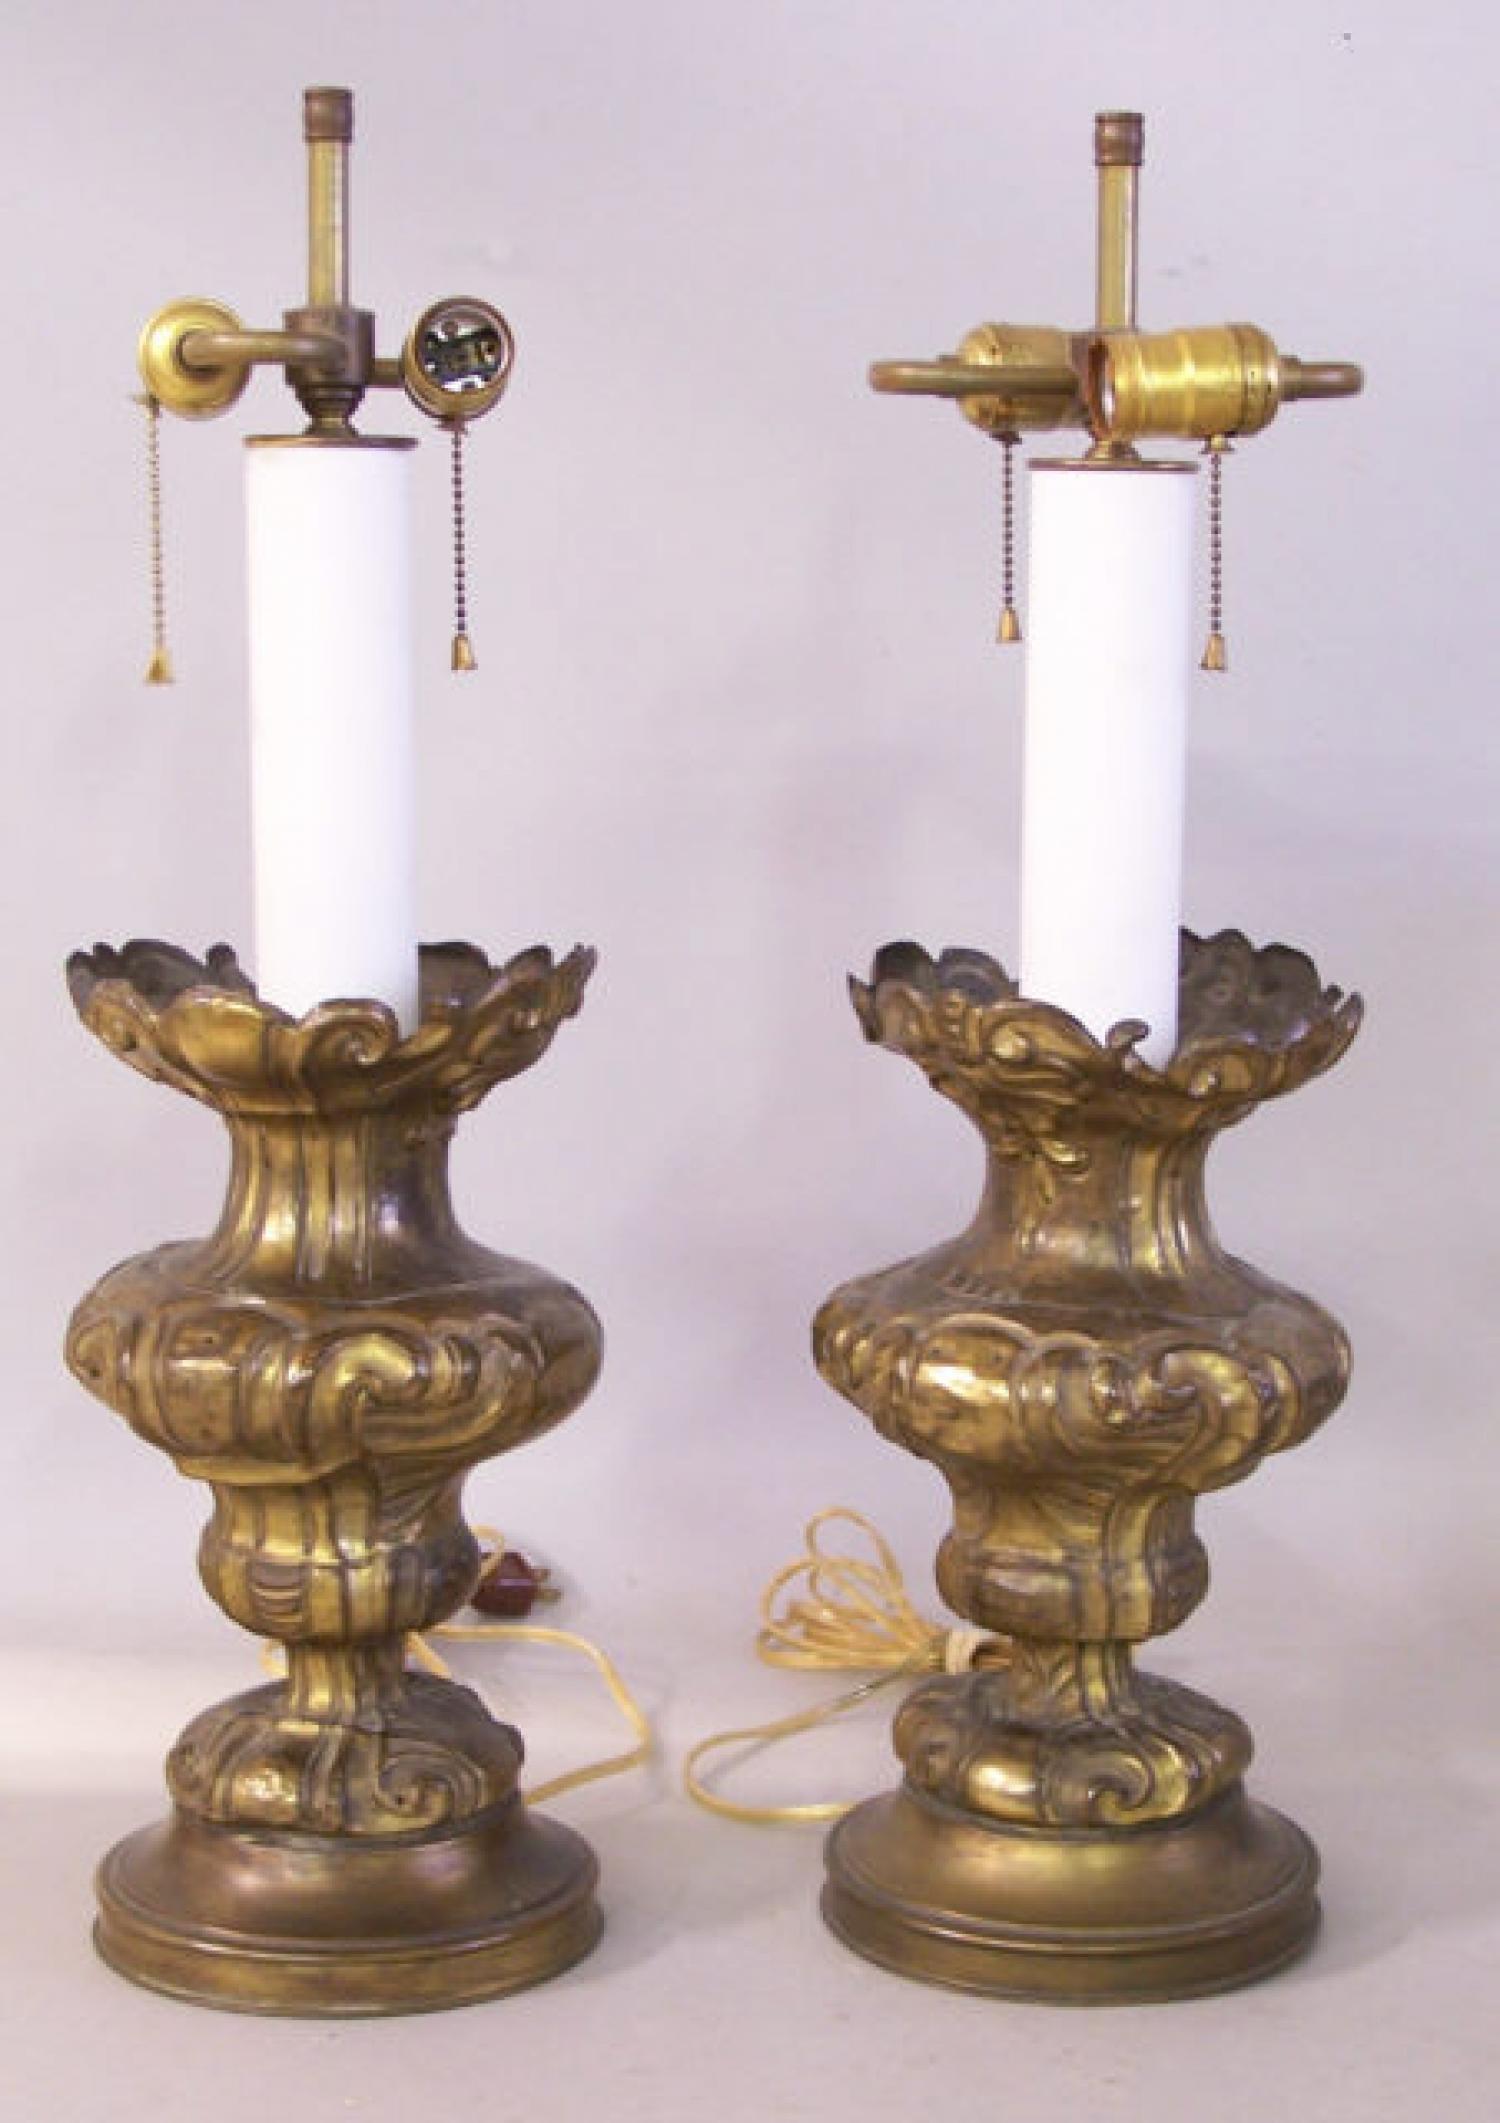 Pair of antique tin repousse Continental lamps c1840